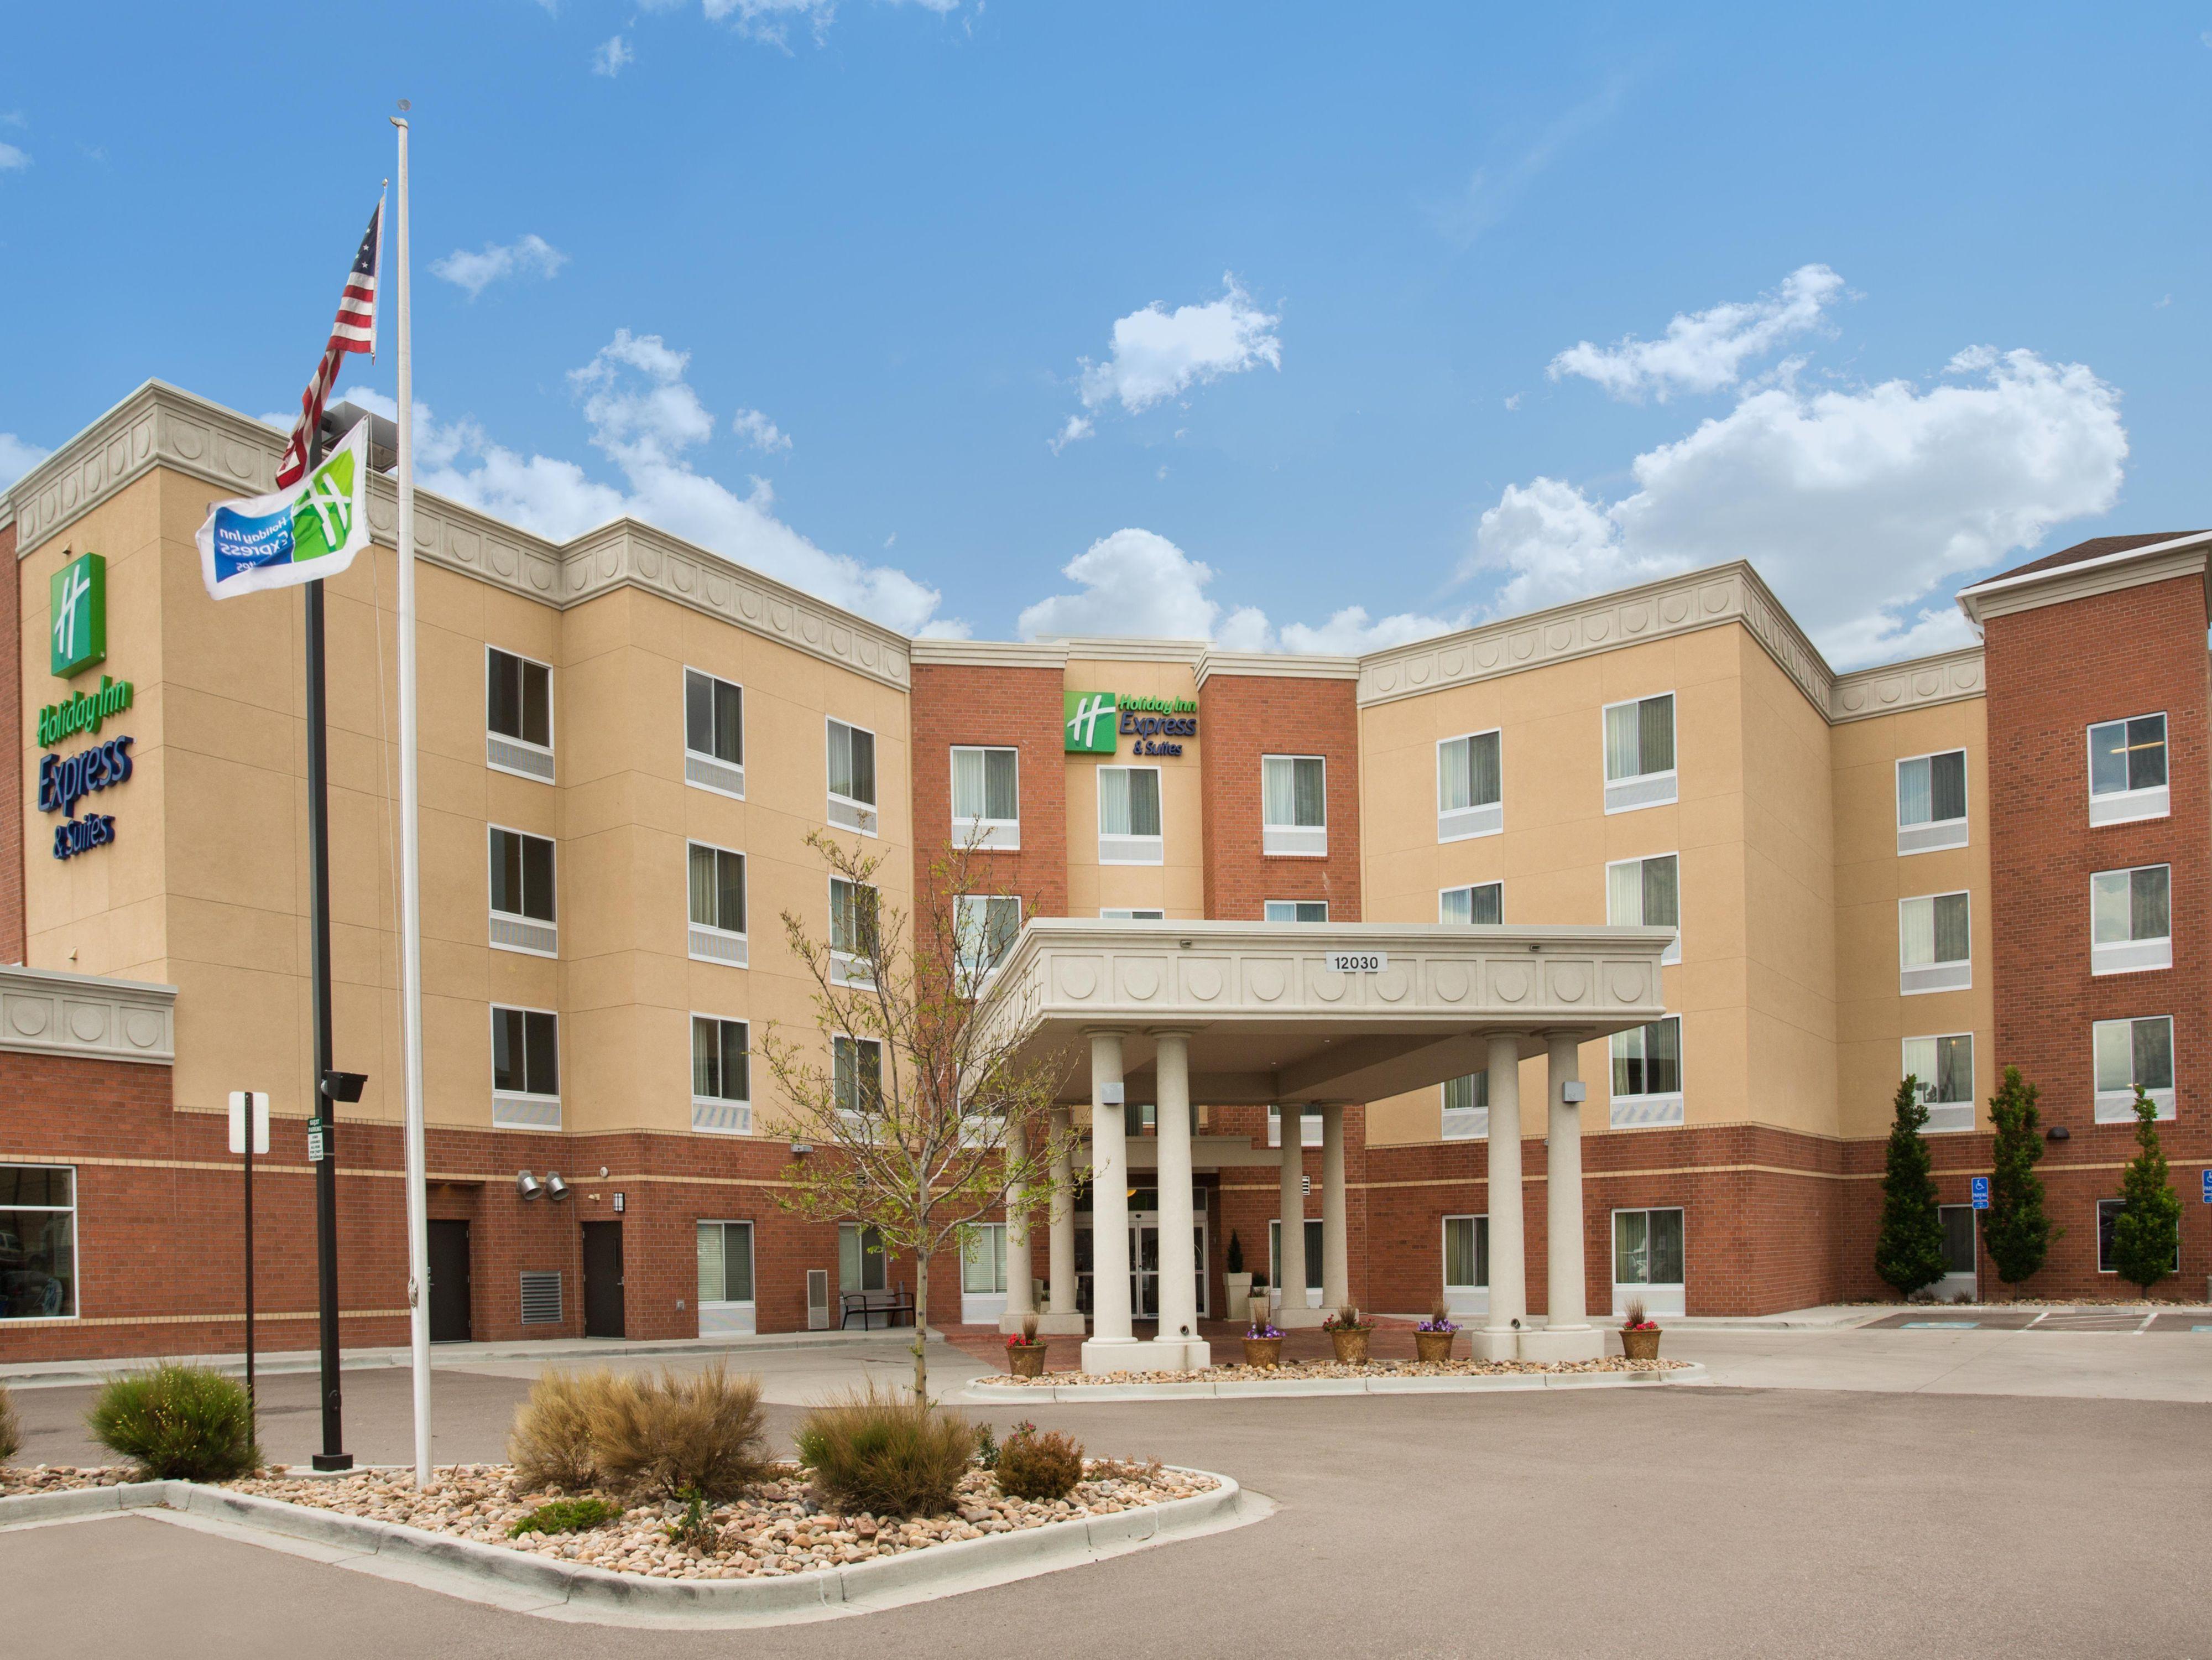 Holiday Inn Express \u0026 Suites Denver North - Thornton Hotel by IHG